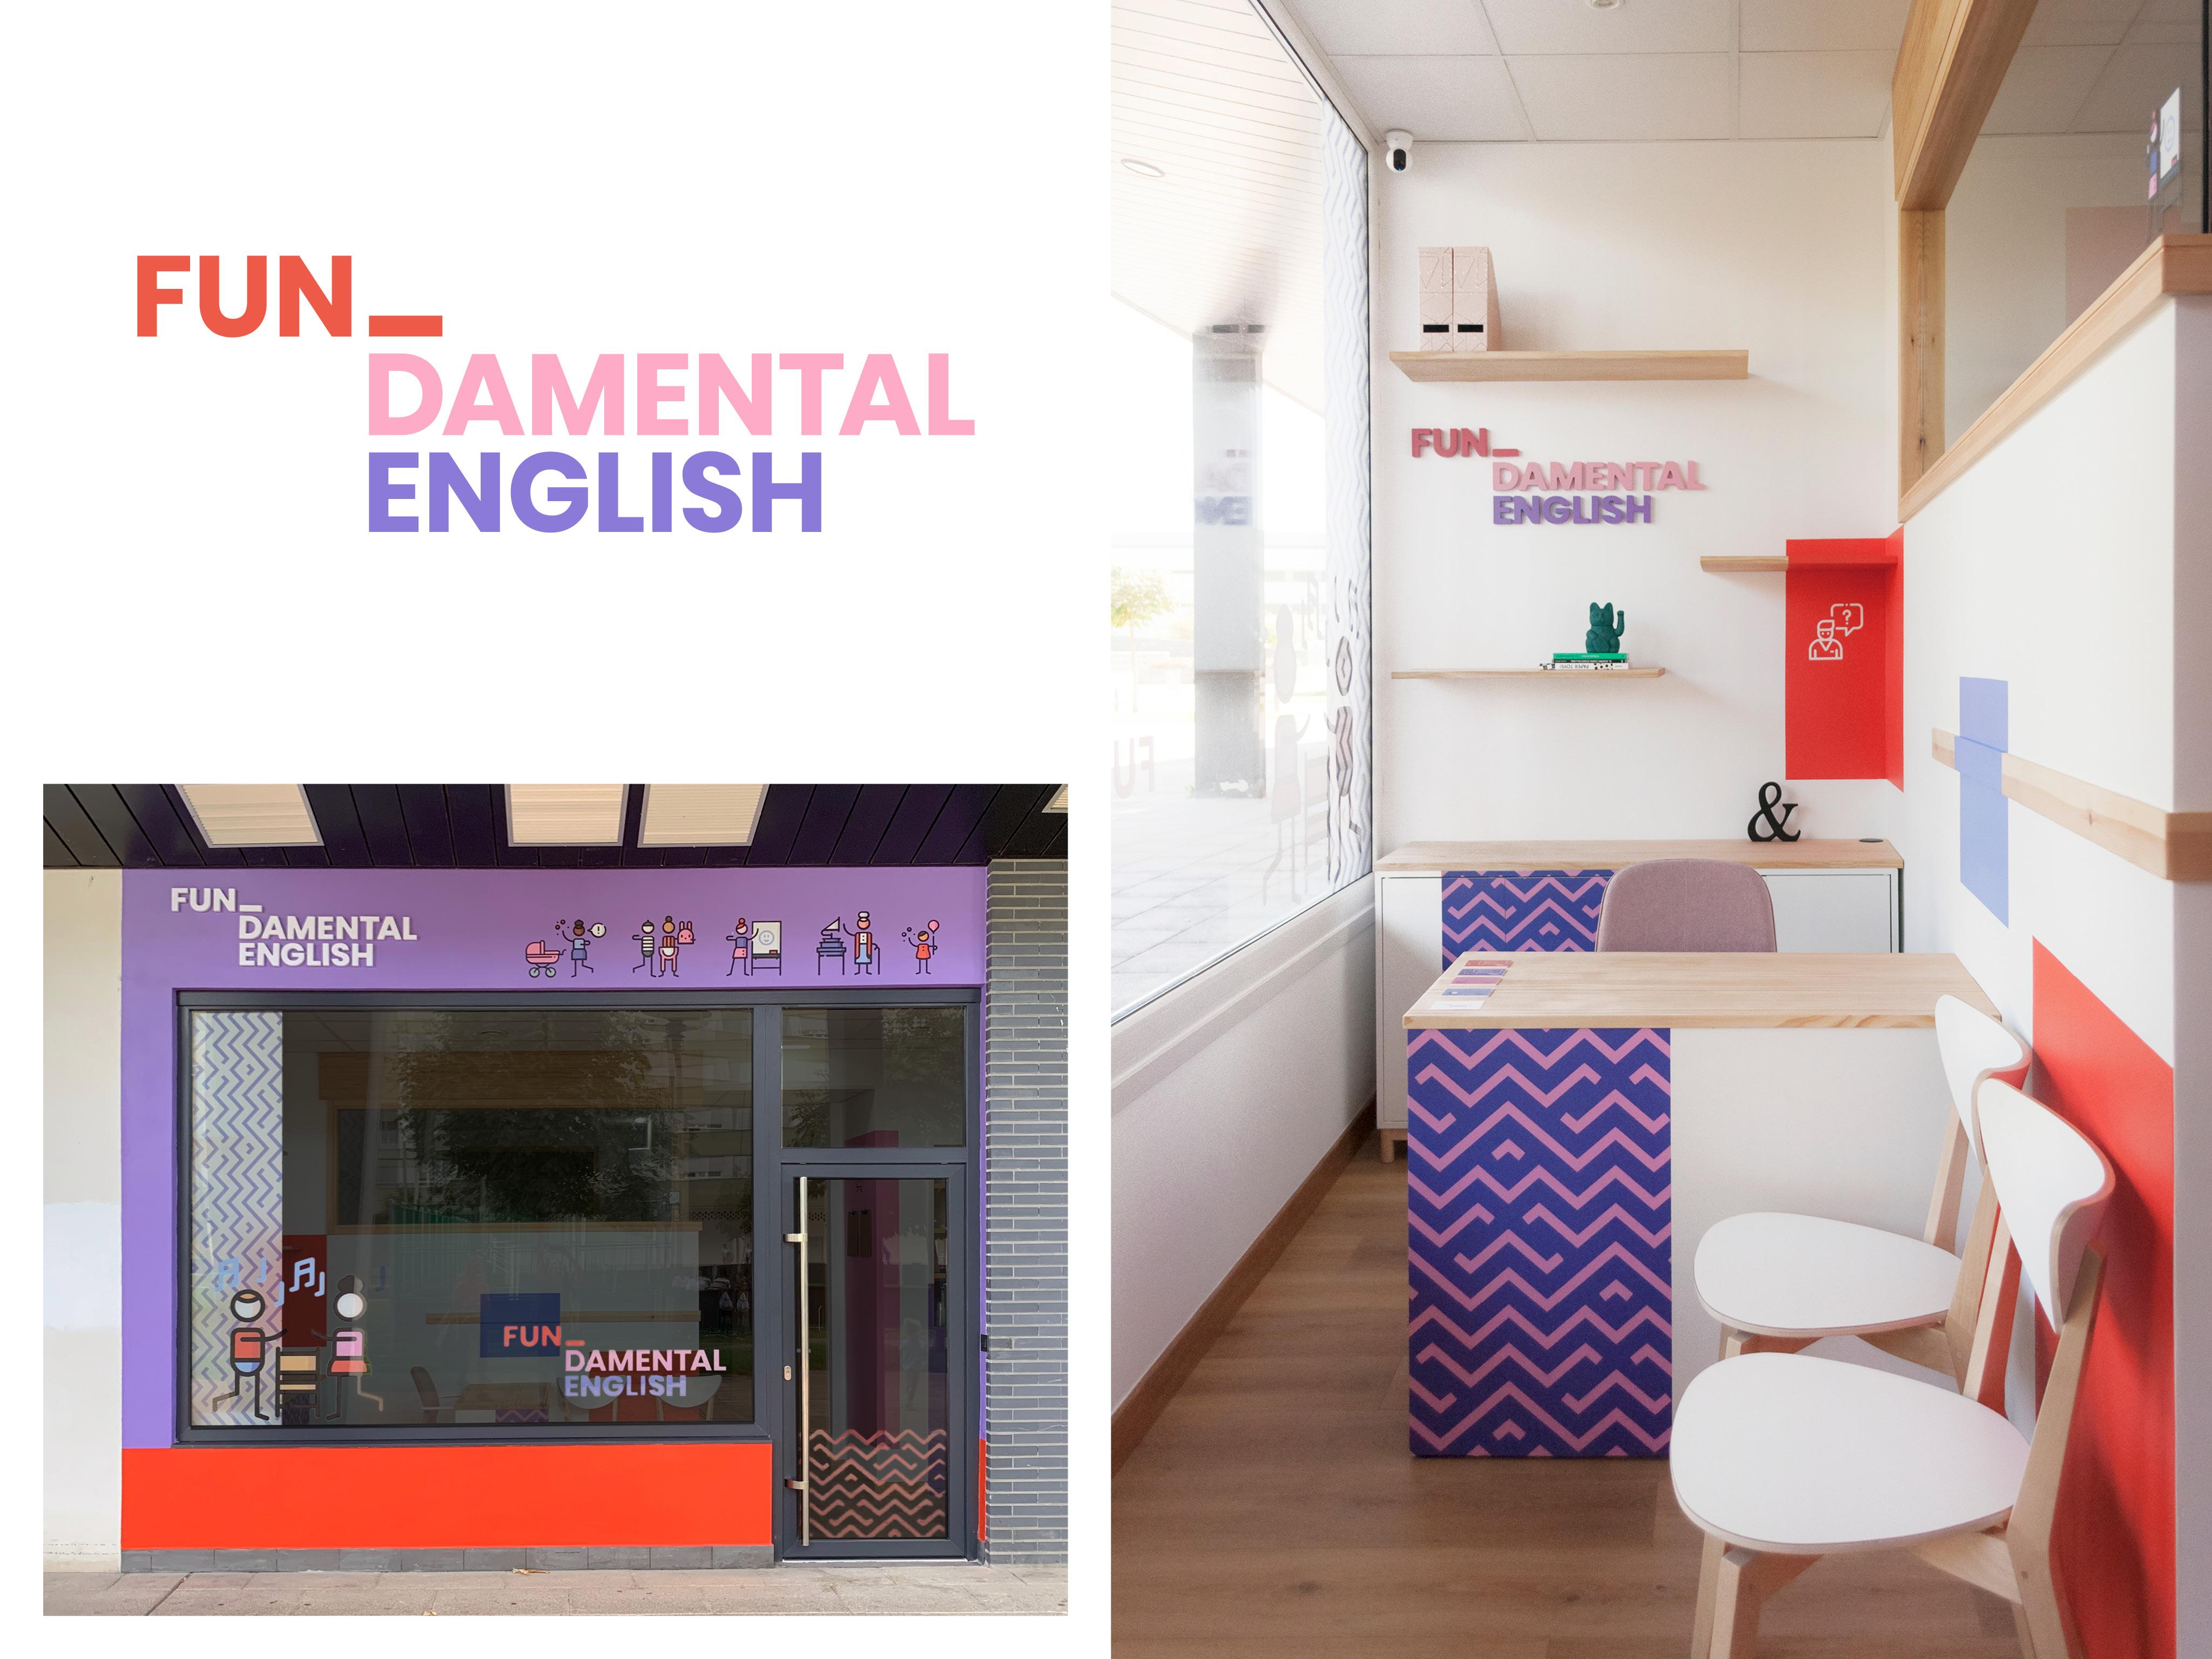 Fundamental English Interior by Avocado - Creative Work